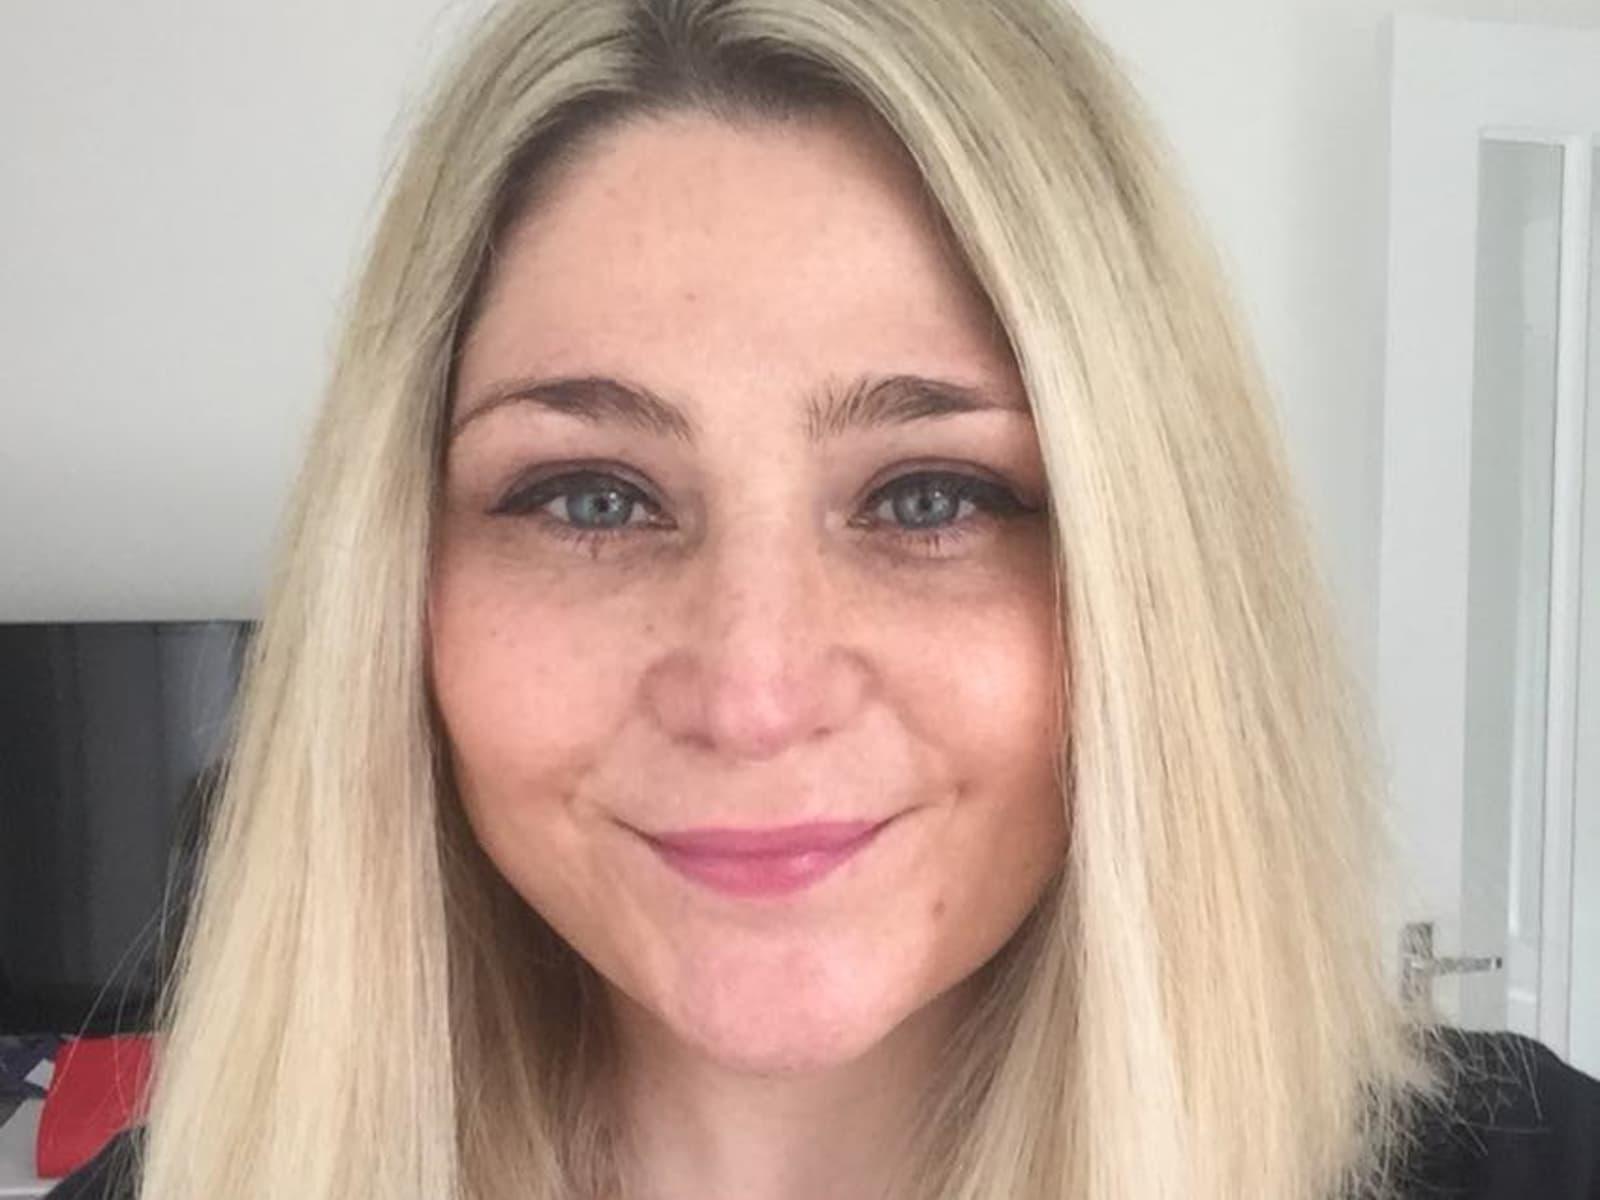 Kelly from Warwick, United Kingdom